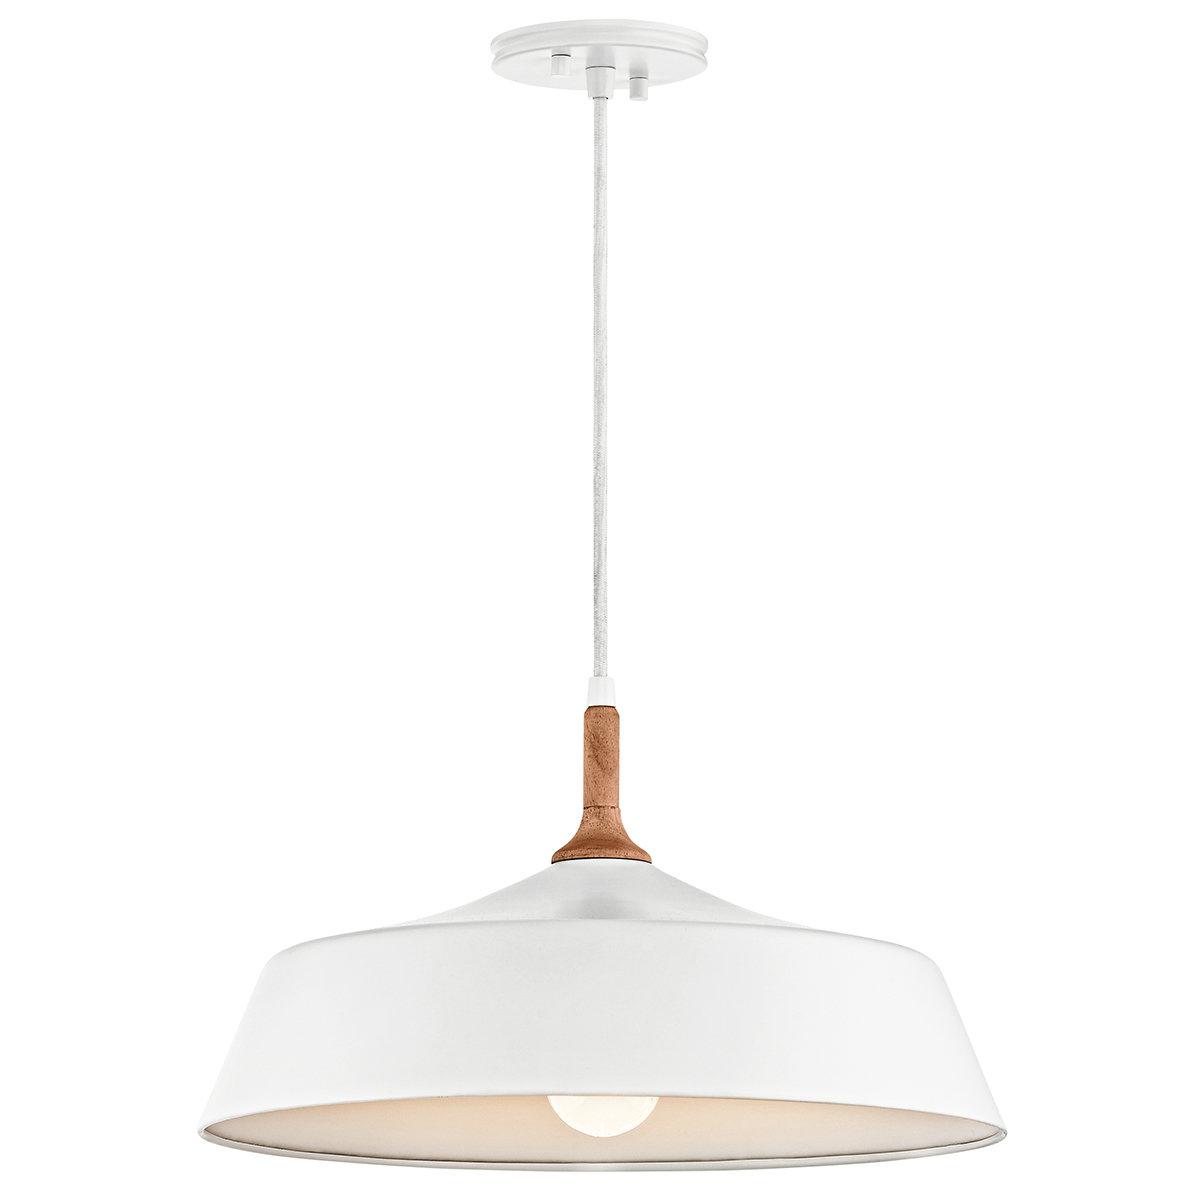 Preferred Ryker 1 Light Single Dome Pendants Regarding Evelyn 1 Light Dome Pendant (View 7 of 25)